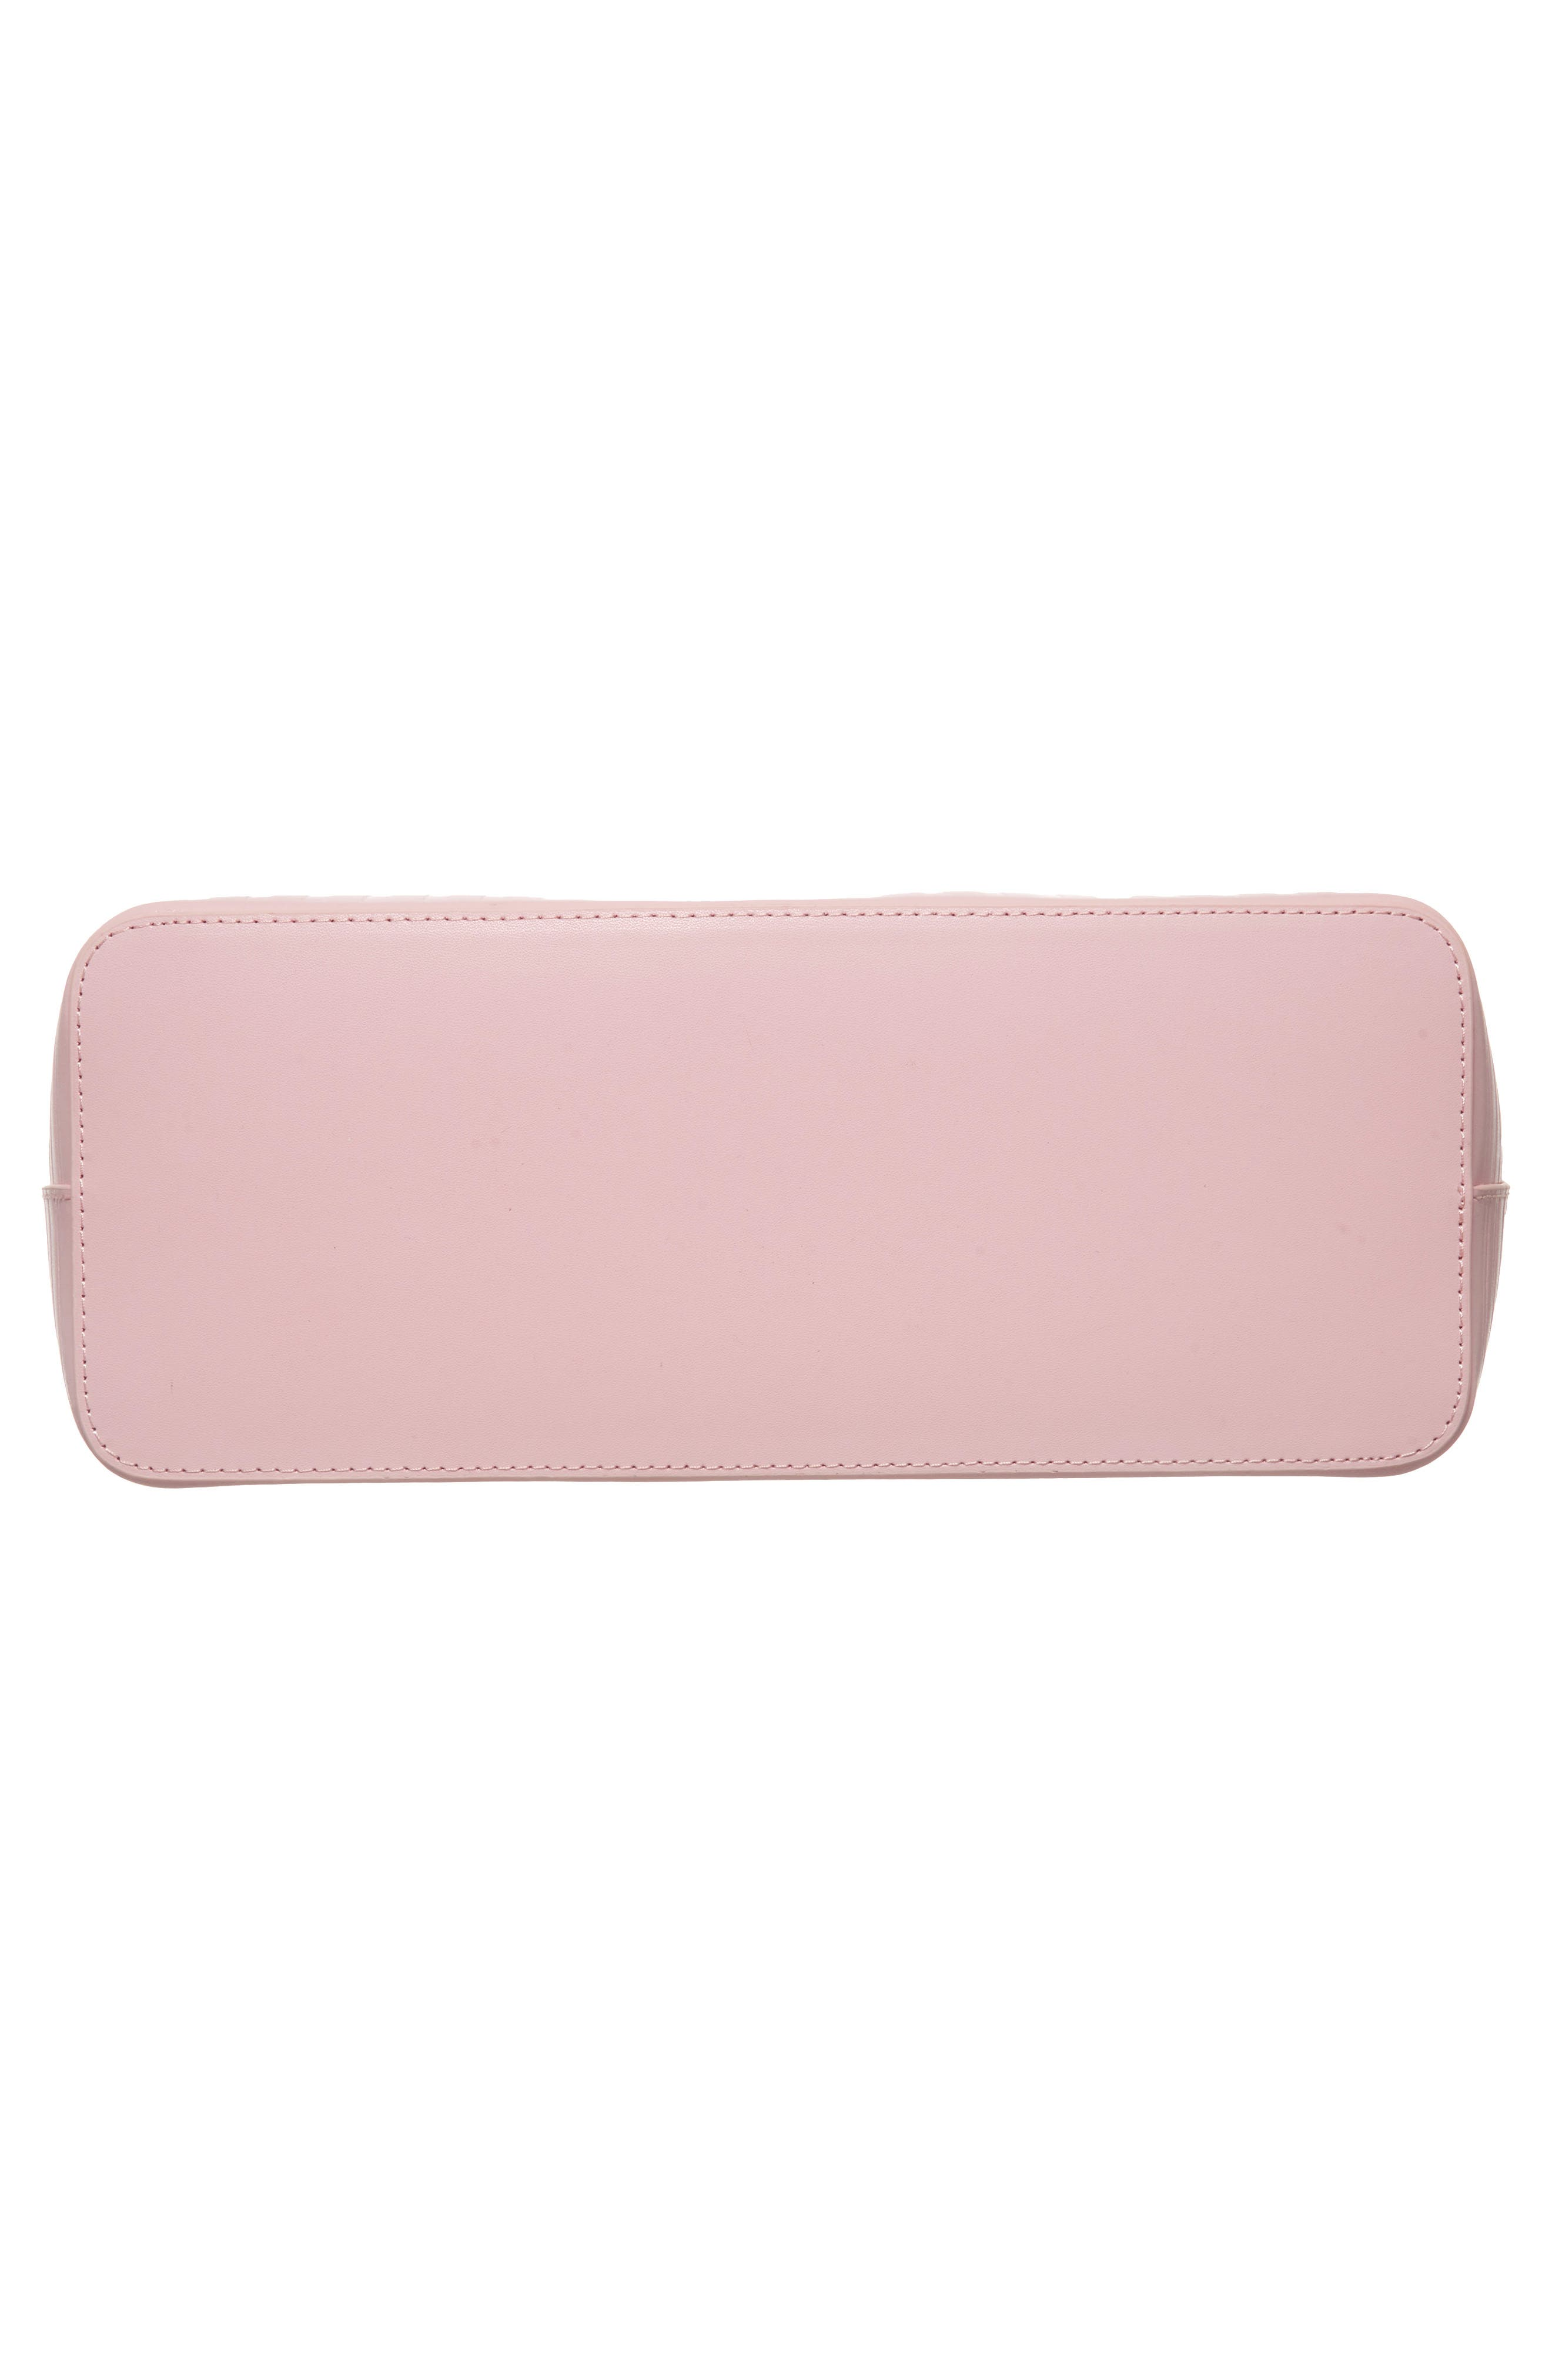 Bow Embossed Leather Shopper,                             Alternate thumbnail 6, color,                             Light Pink